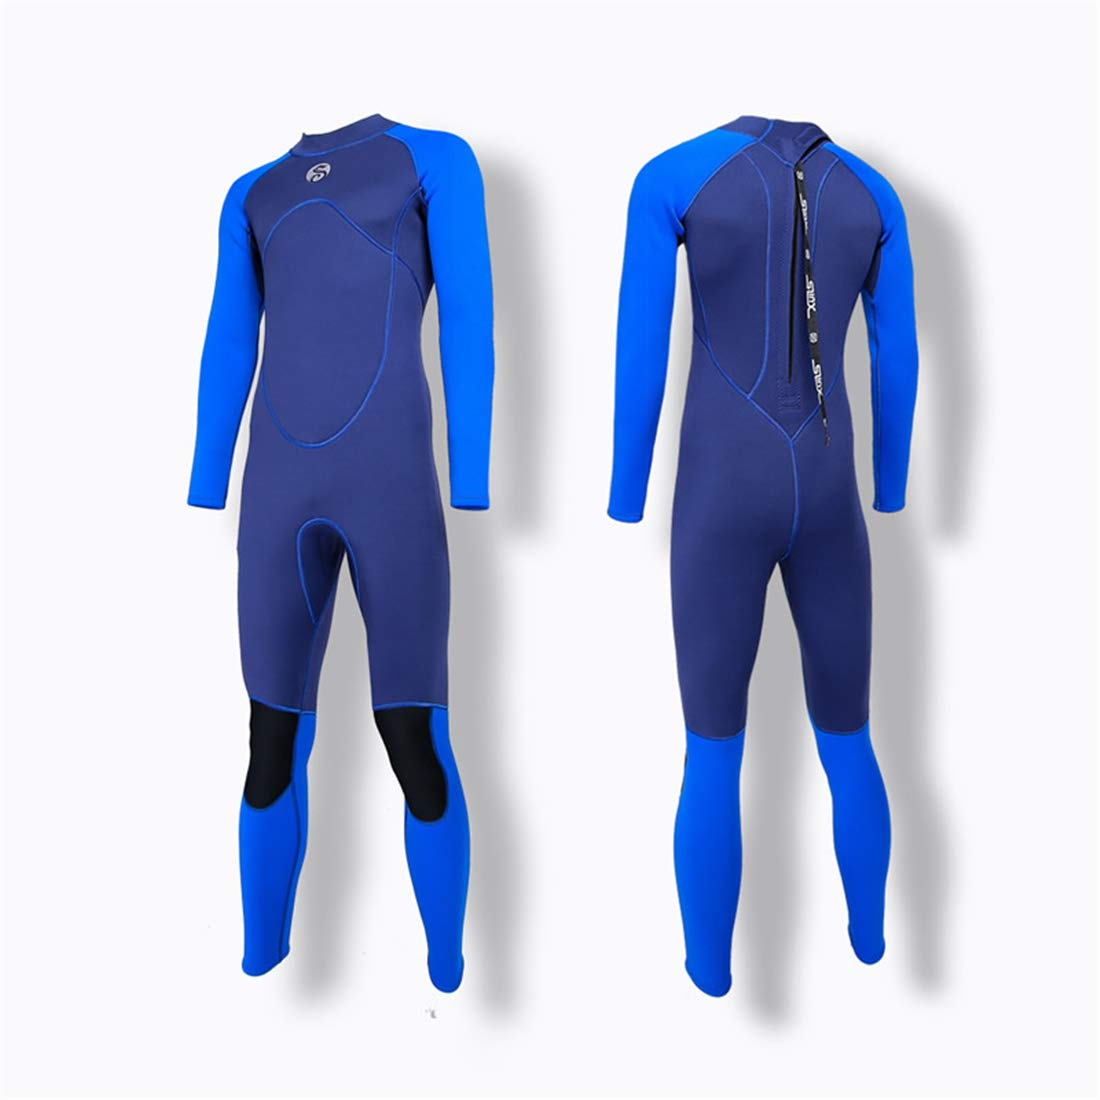 【60%OFF】 メンズウェットスーツスリーブ3mm ダイビングスーツネオプレンウェットスーツフルスーツスキューバダイビング水泳,C,M B07NY7SWPG B07NY7SWPG Large Large|C Large|C C Large, 諌早市:da04b0c1 --- ballyshannonshow.com